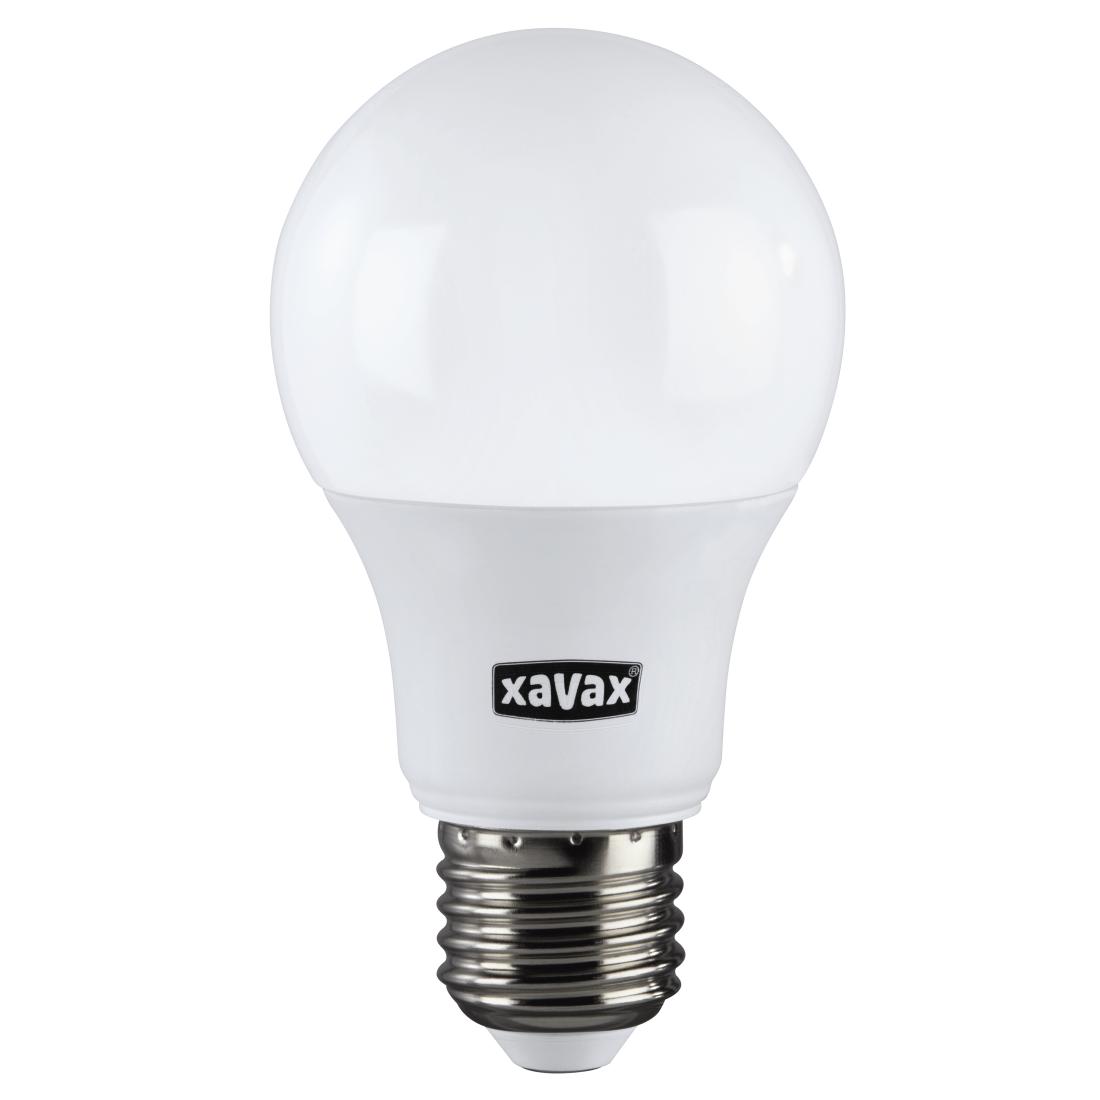 Xavax - Die Starke Marke im Haushalt xavax.eu | 00112575 Xavax LED ...